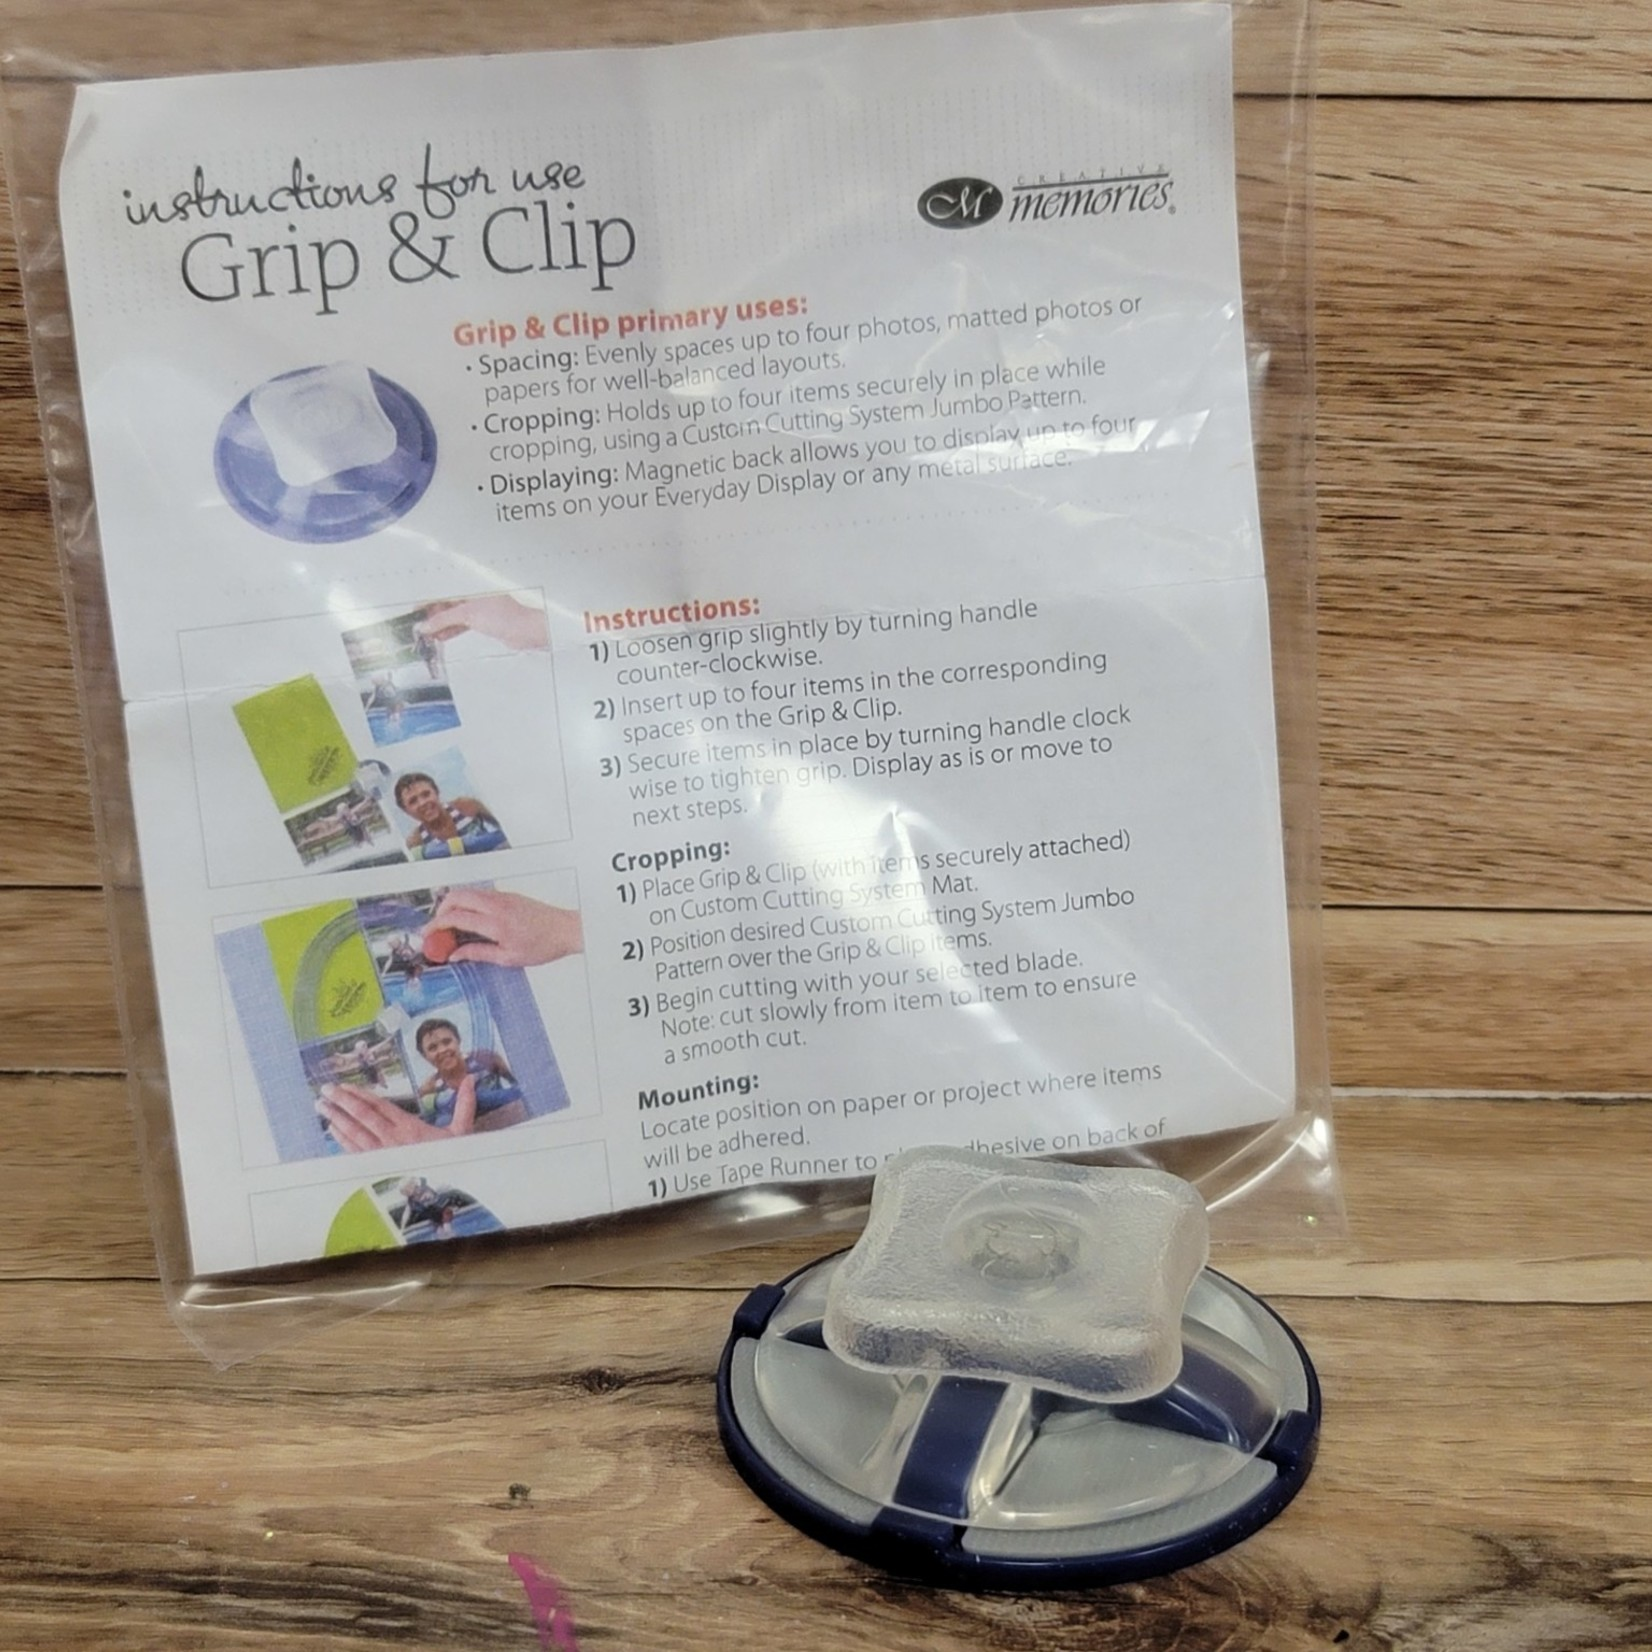 Creative Memories - Grip & Clip